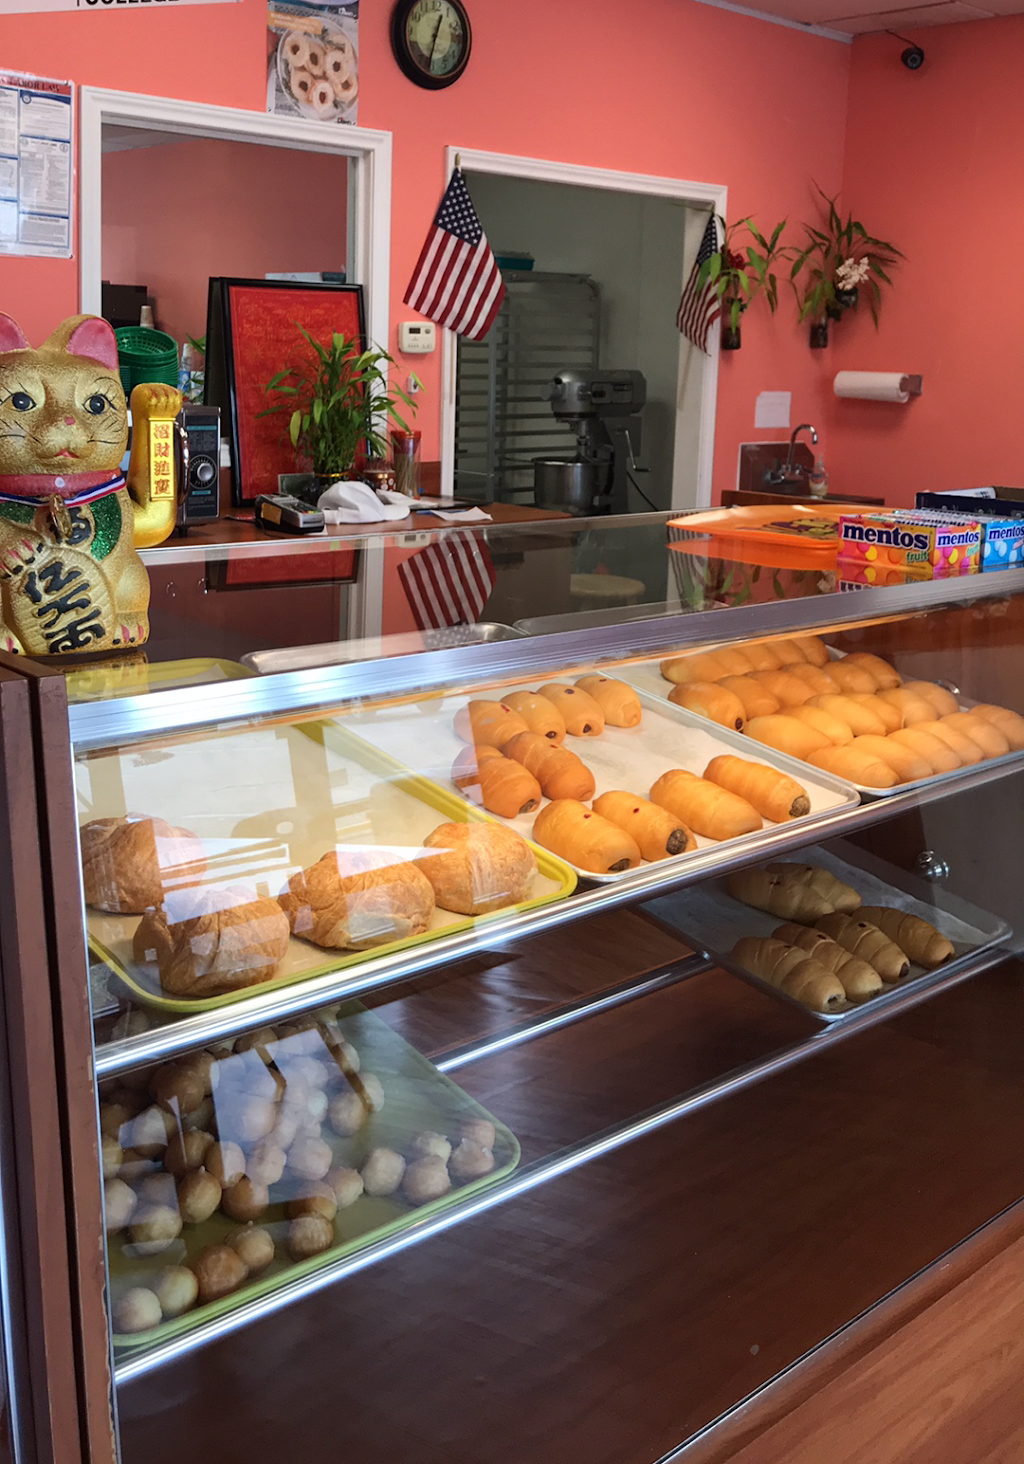 Snowflake donuts   restaurant   7010 Woodridge Dr, Houston, TX 77087, USA   8327425578 OR +1 832-742-5578